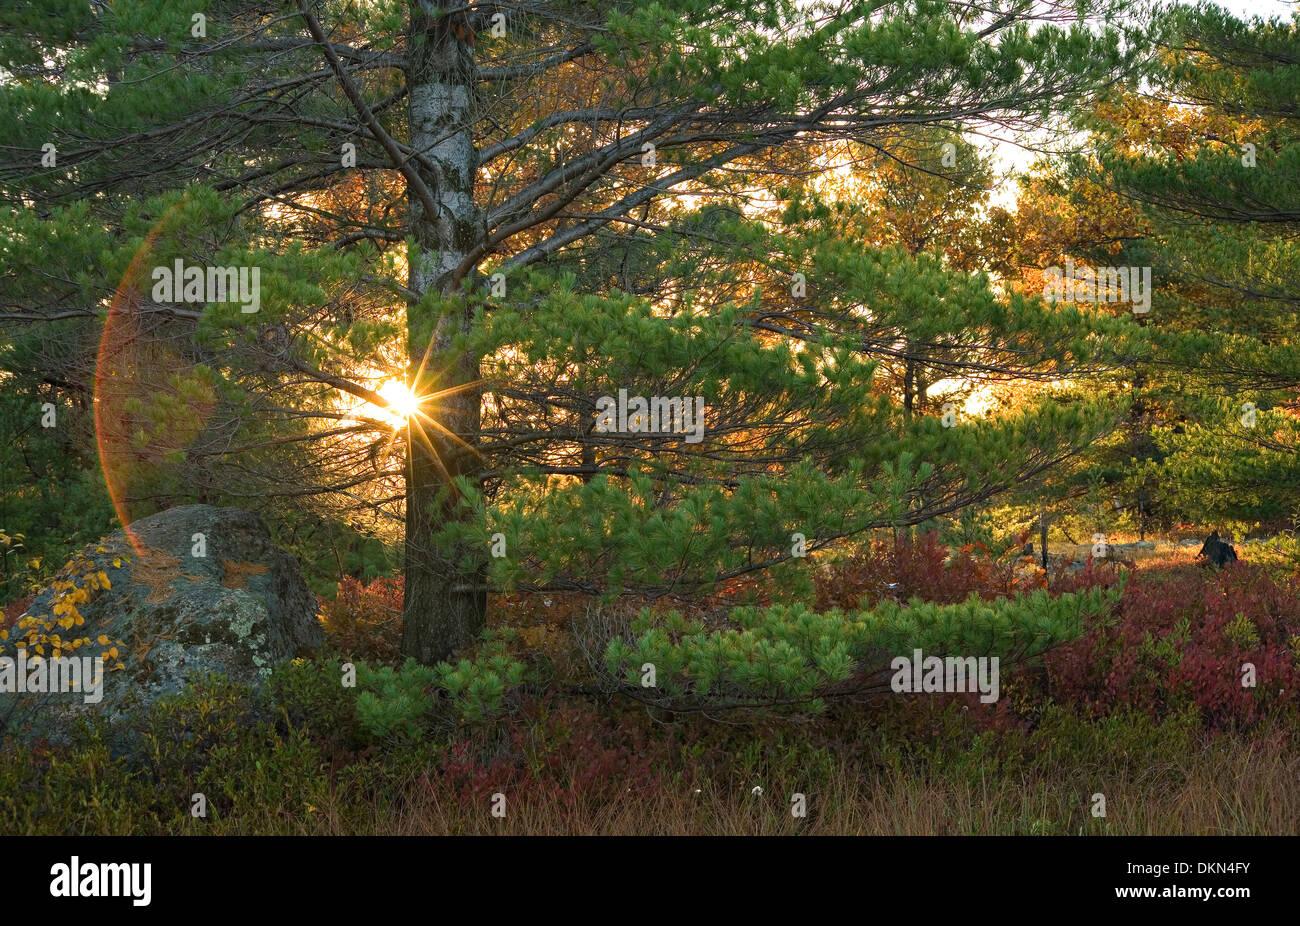 A sunstar shines through the trees during autumn in Torrance Barrens Dark sky Preserve, Muskoka, Ontario, Canada. - Stock Image